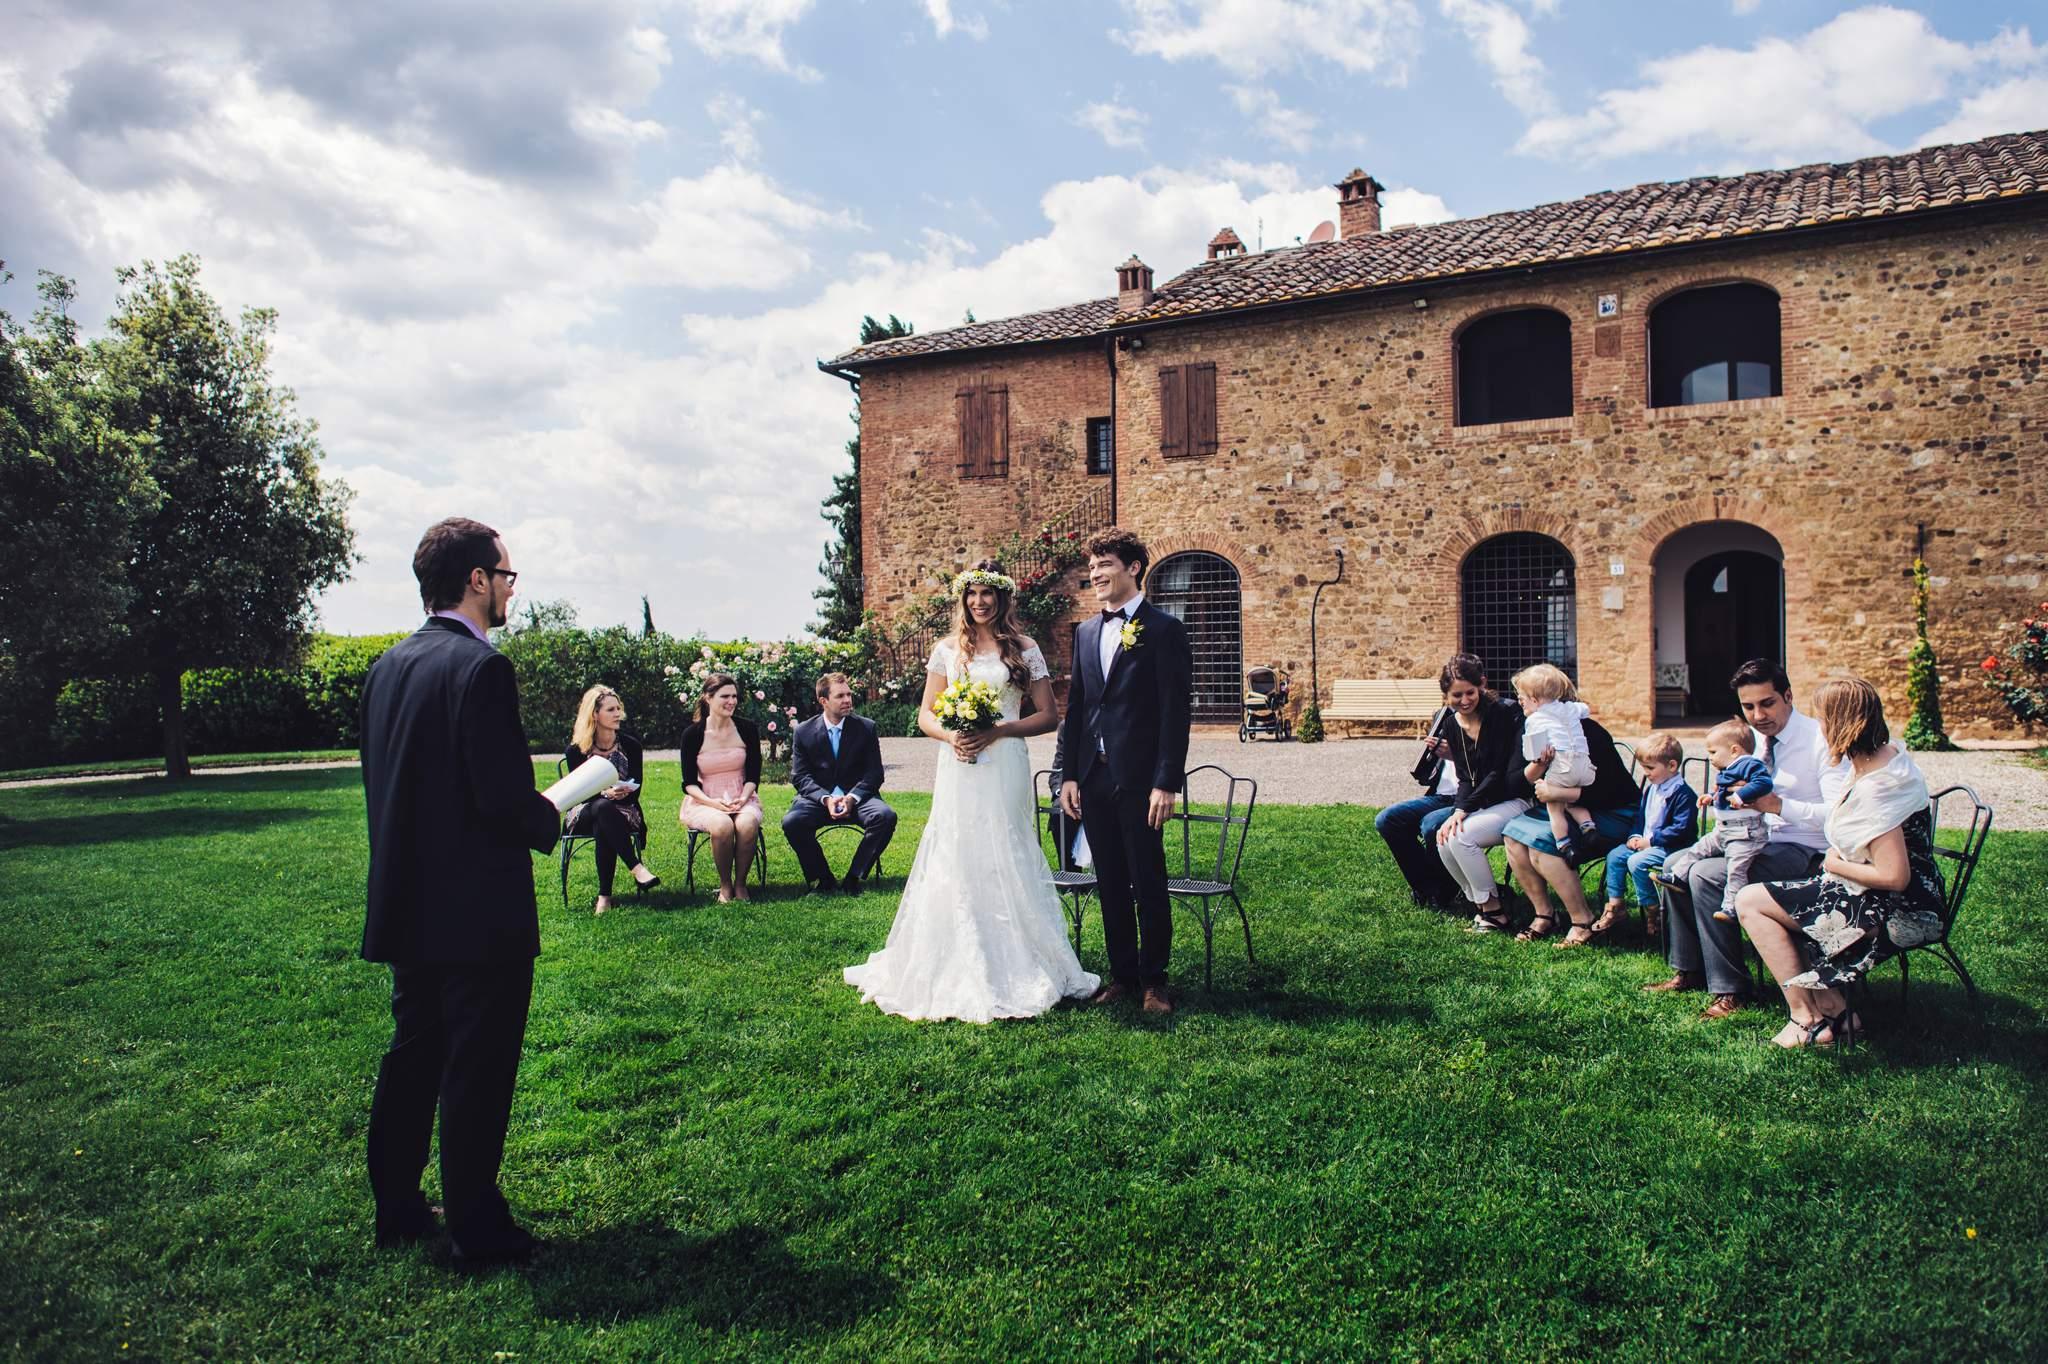 14wedding-photographer-tuscany-siena